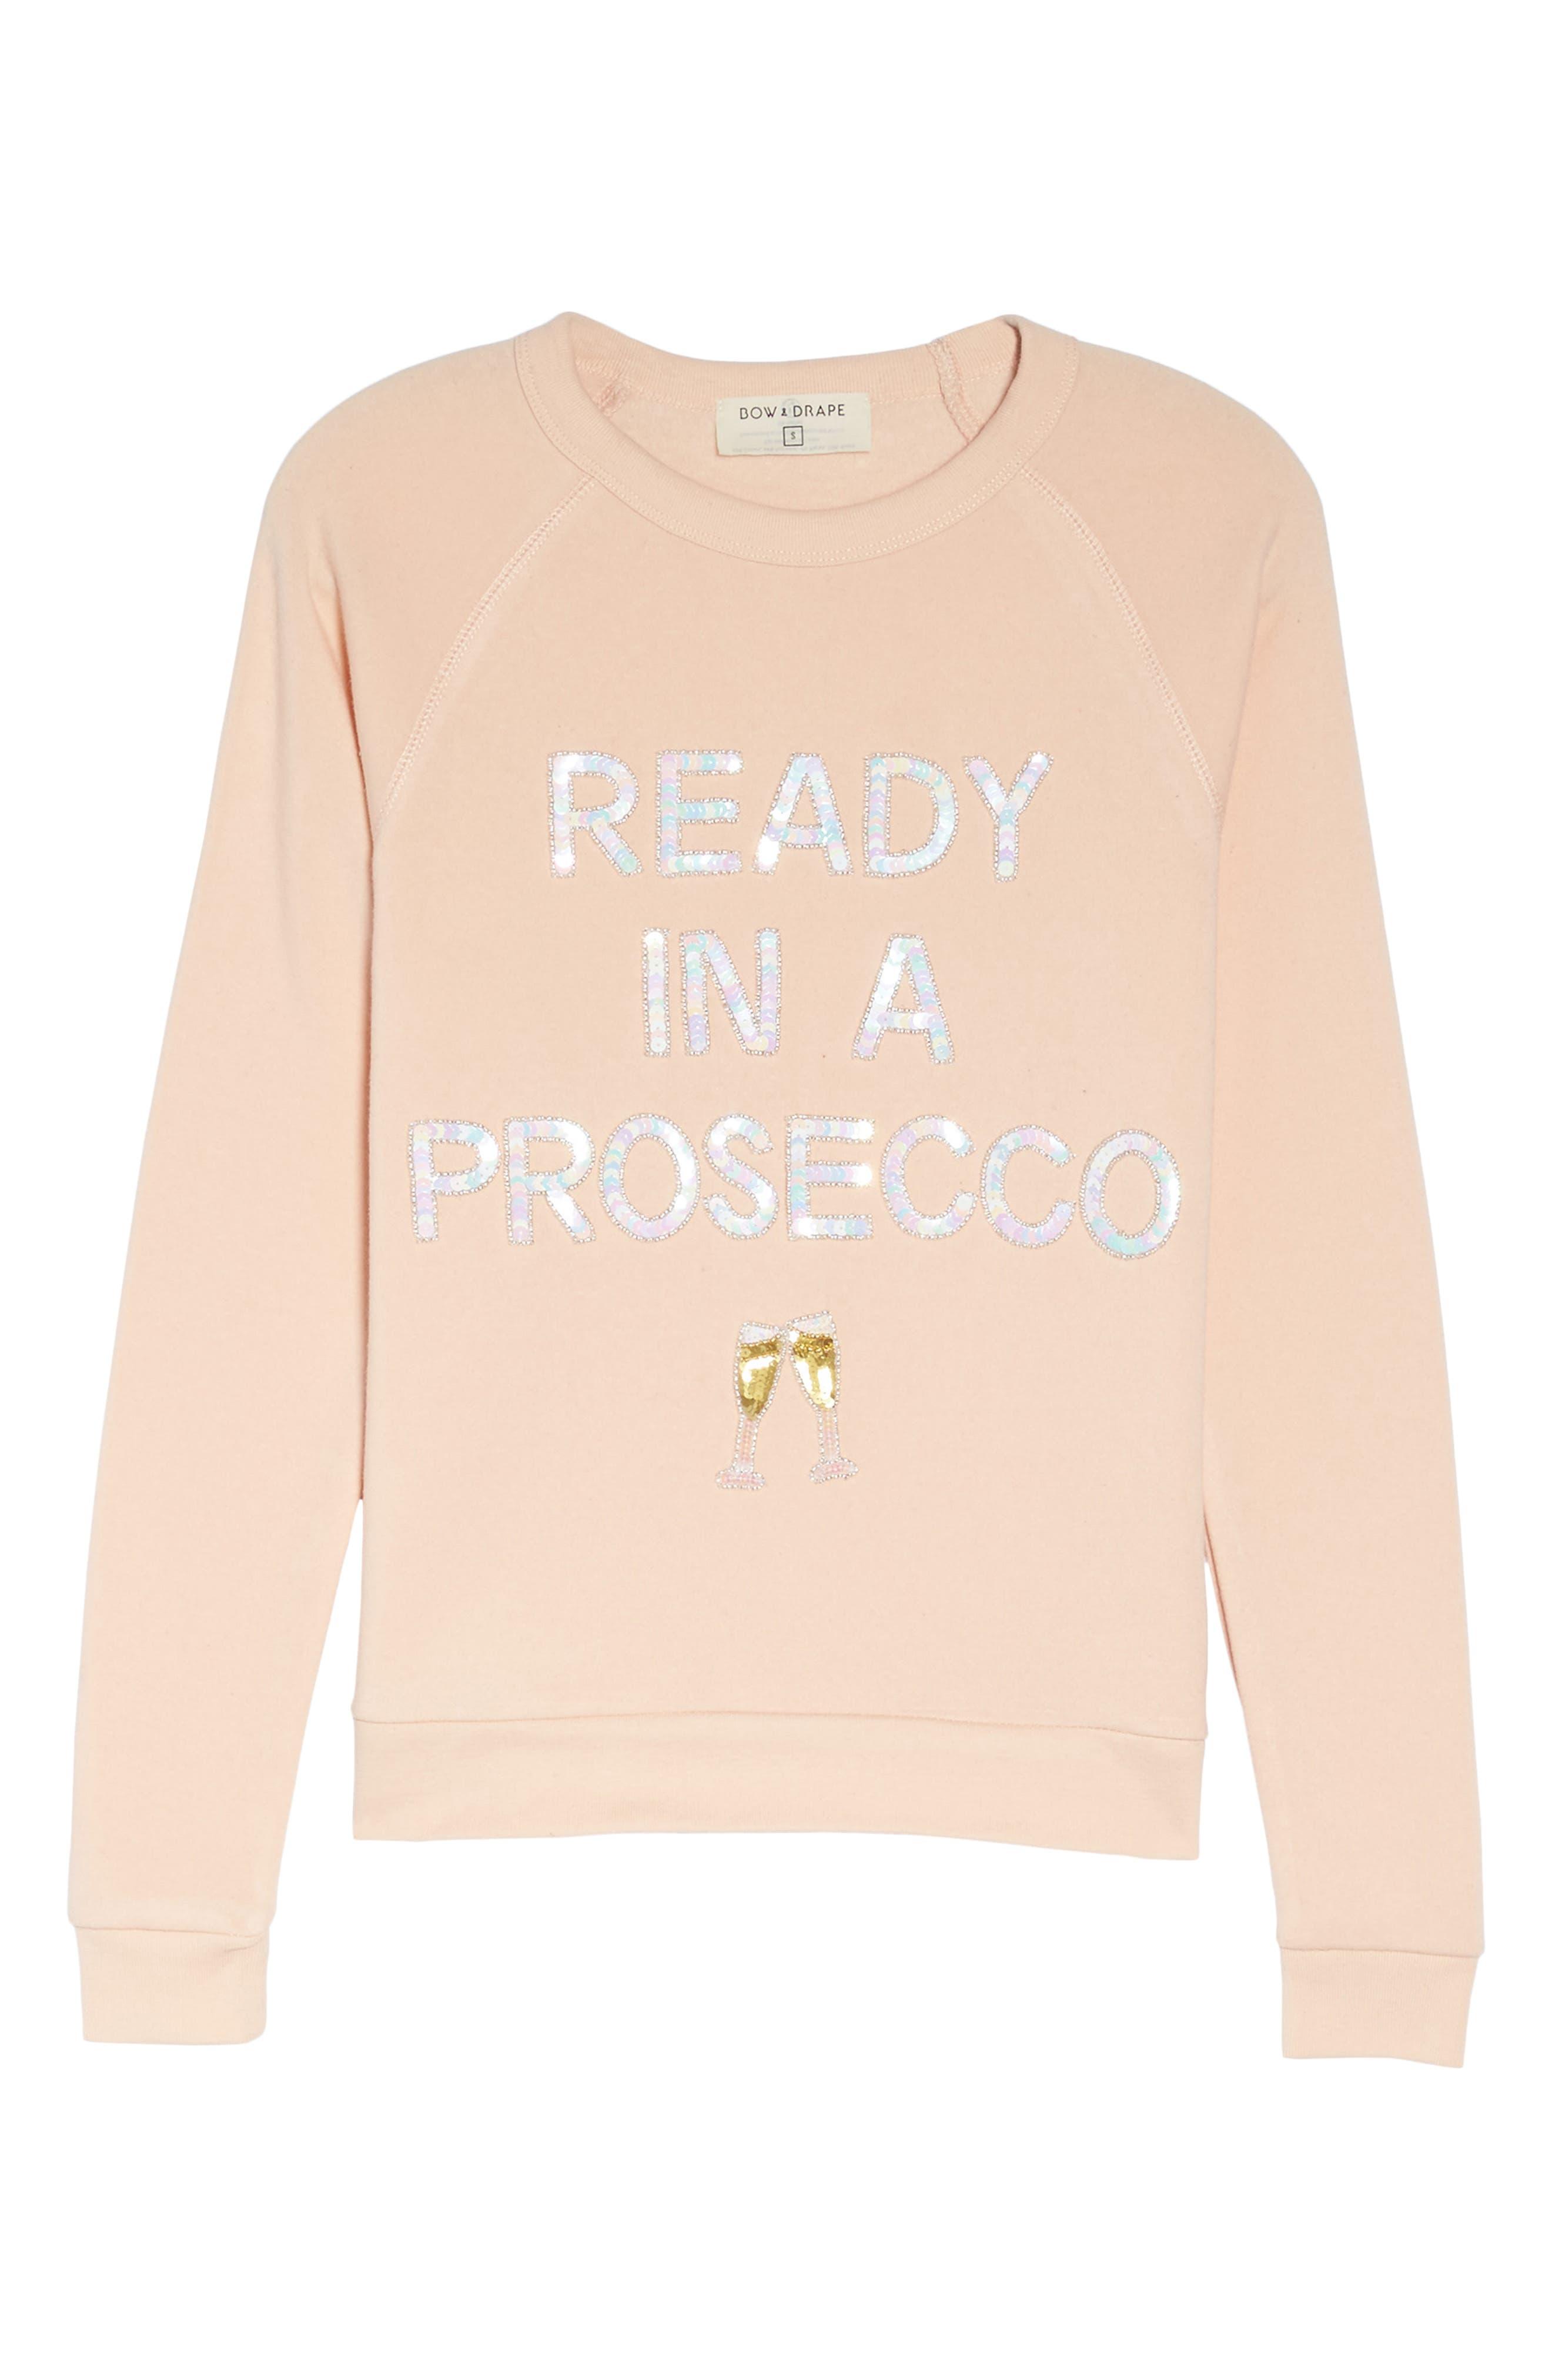 Alternate Image 6  - Bow & Drape Ready in a Prosecco Sweatshirt